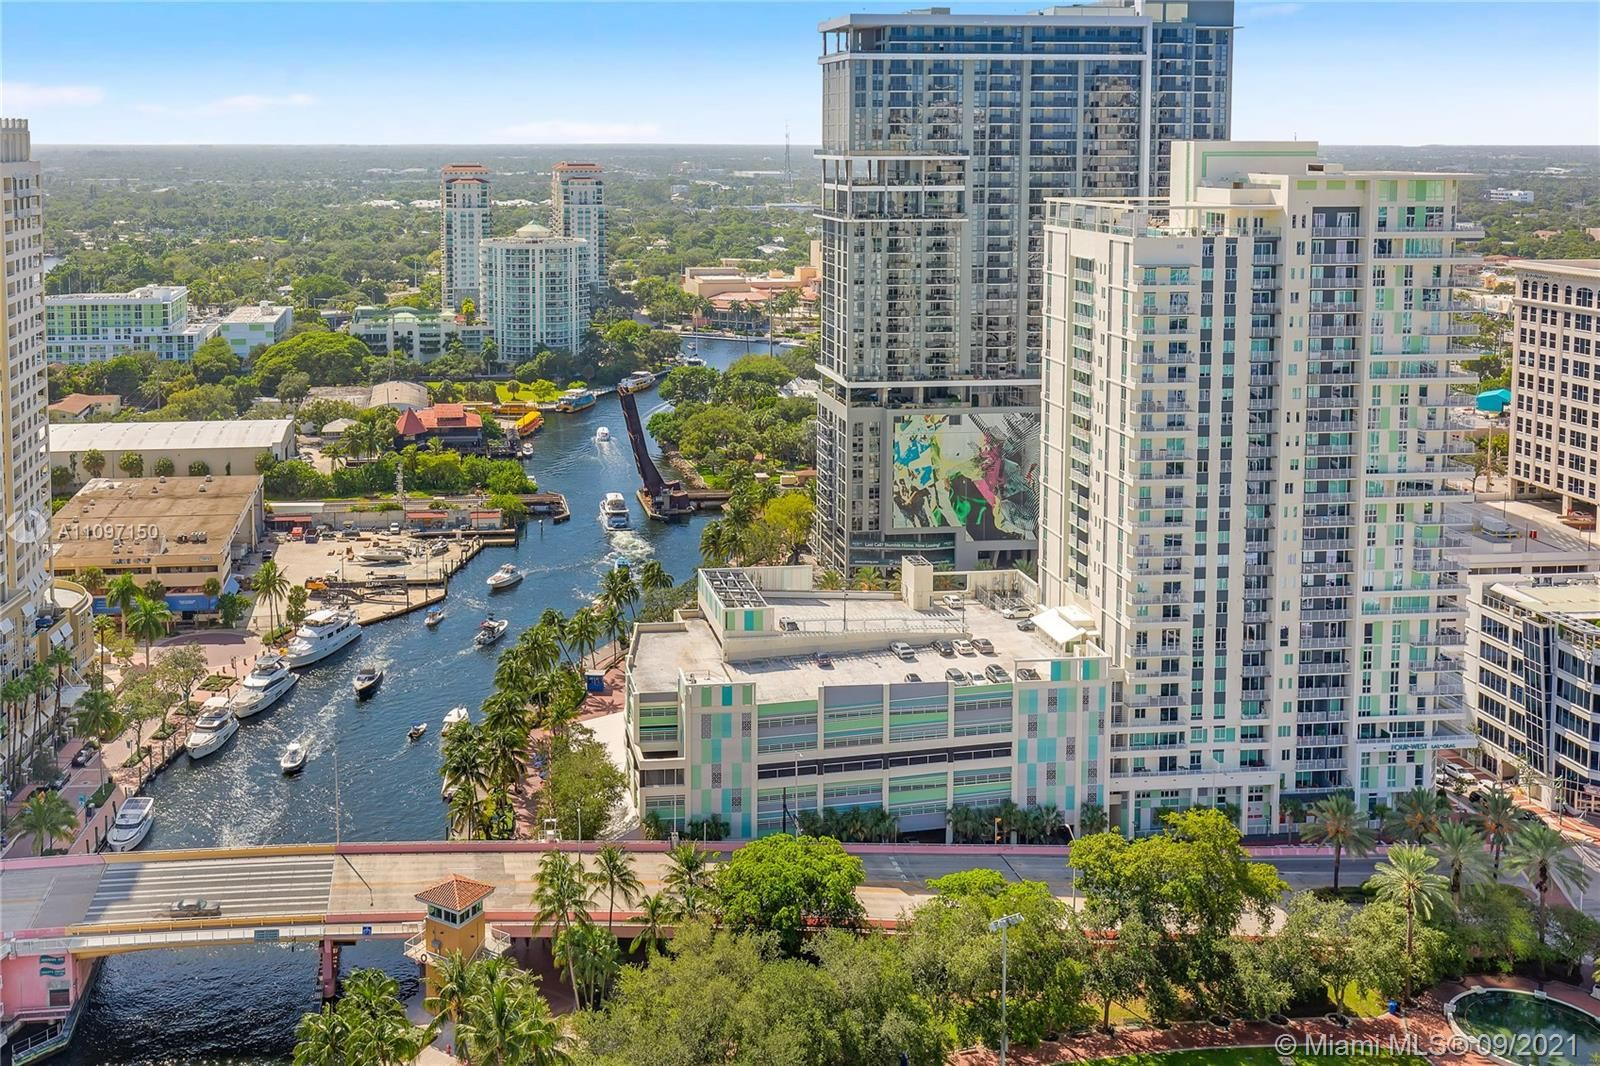 333 Las Olas Way #3006, Fort Lauderdale, FL 33301 - #: A11097150